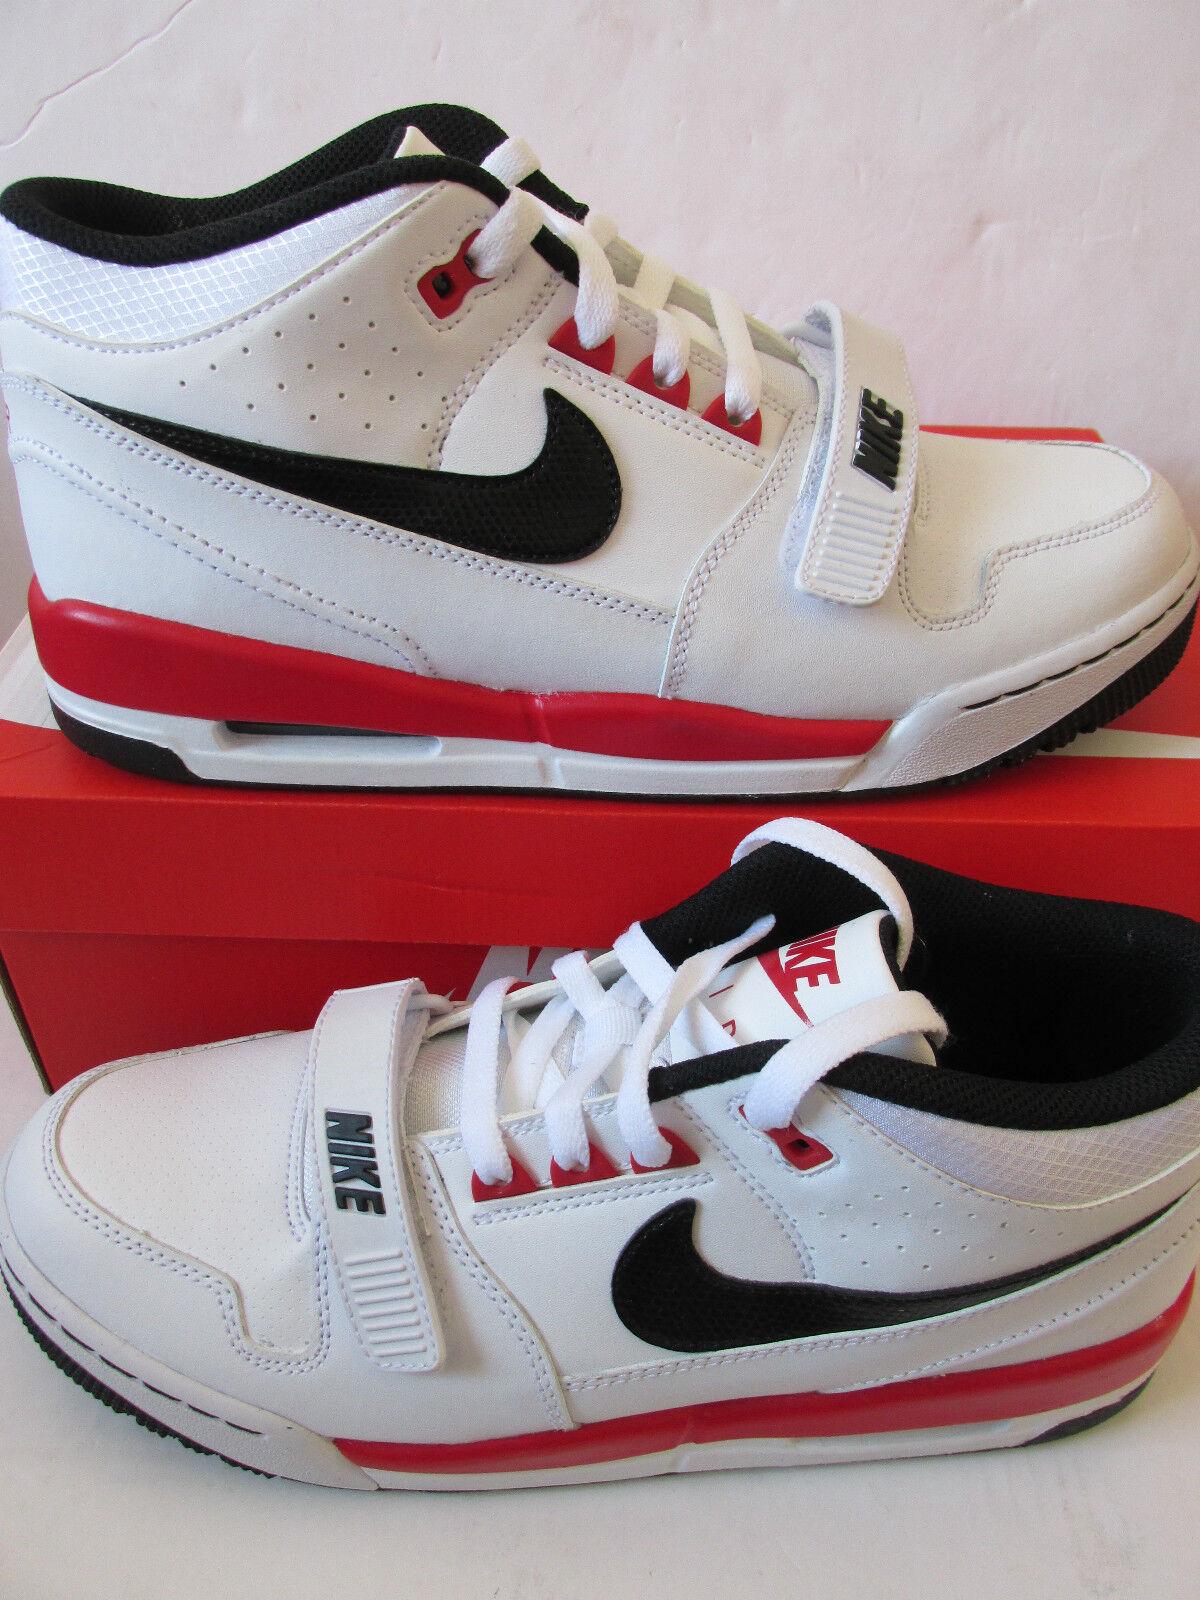 Nike air alphalution Uomo hi top formatori 684716 106 scarpe, scarpe